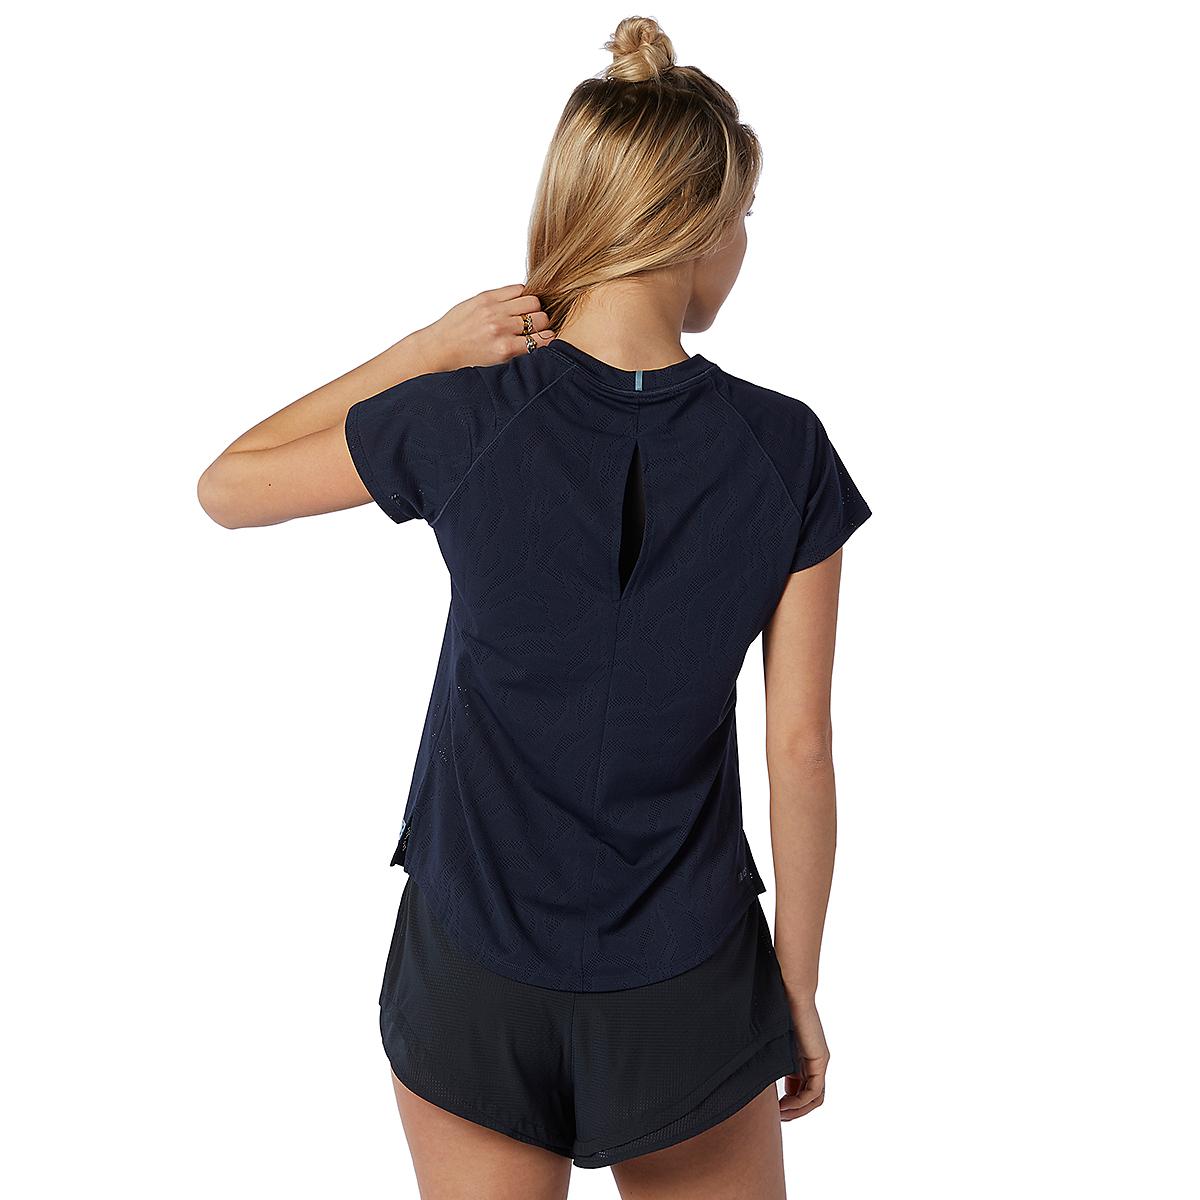 Women's New Balance Q Speed Fuel Jacquard Short Sleeve - Color: Eclipse - Size: XS, Eclipse, large, image 2